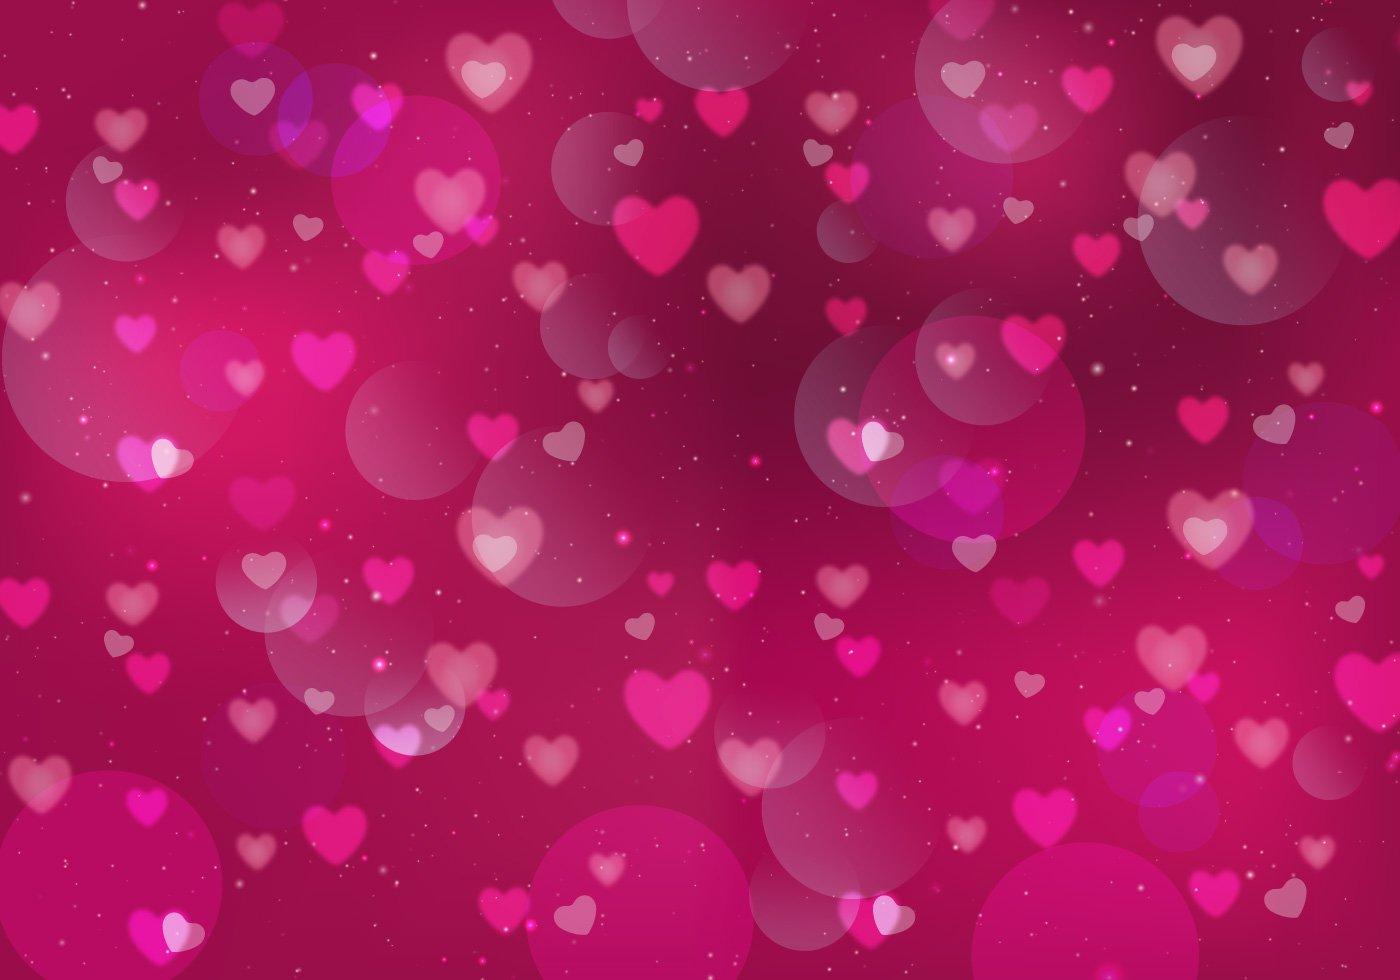 pink heart backgrounds wallpapersafari